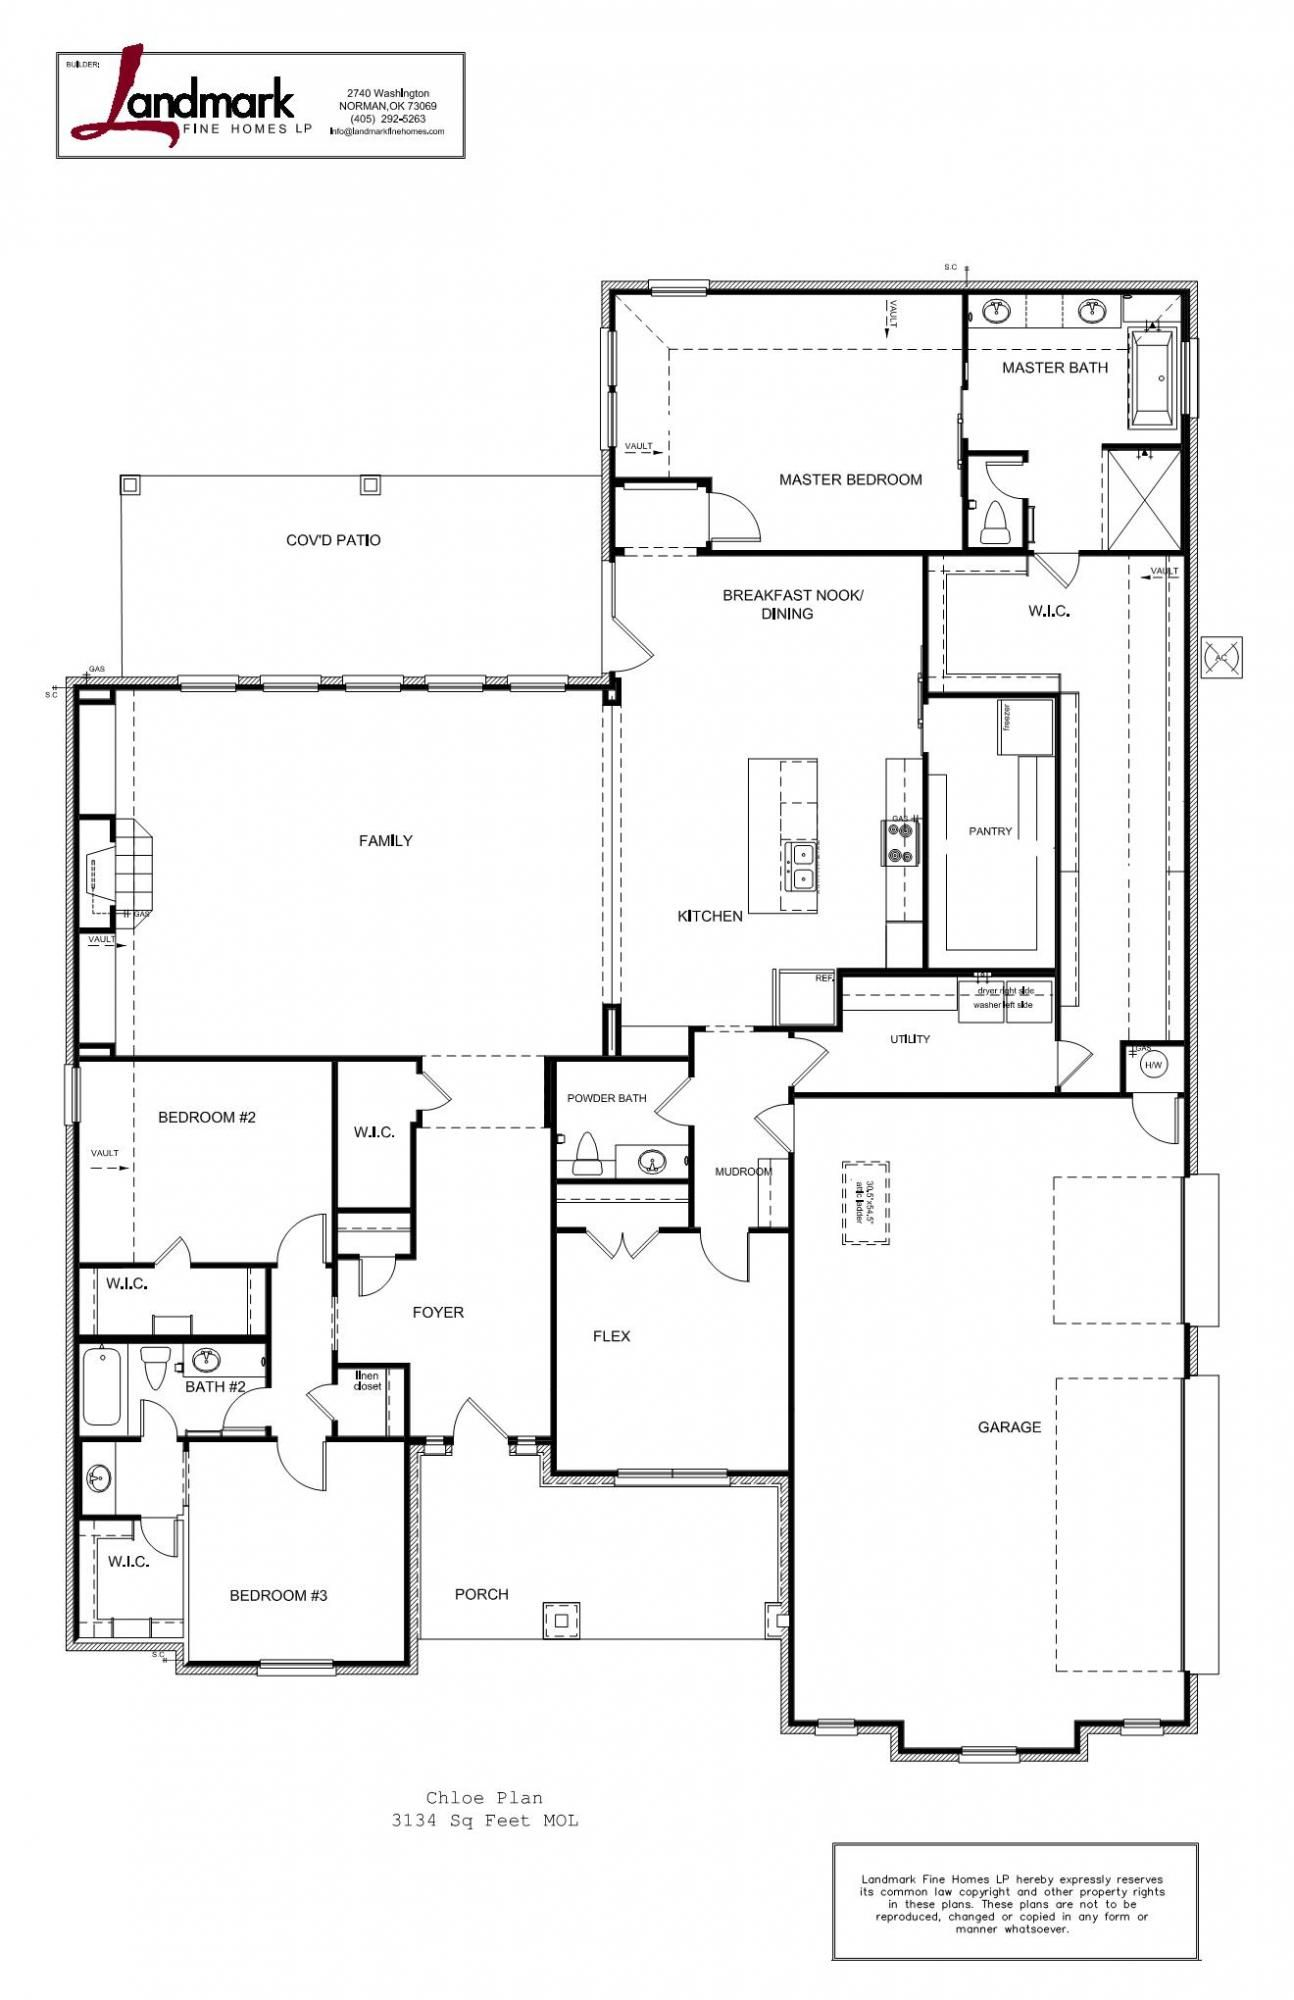 Chloe | Approx SF: 3,134 | Beds: 4 | Full Baths: 2 | Half Baths: 2 | Custom Home Builders OKC